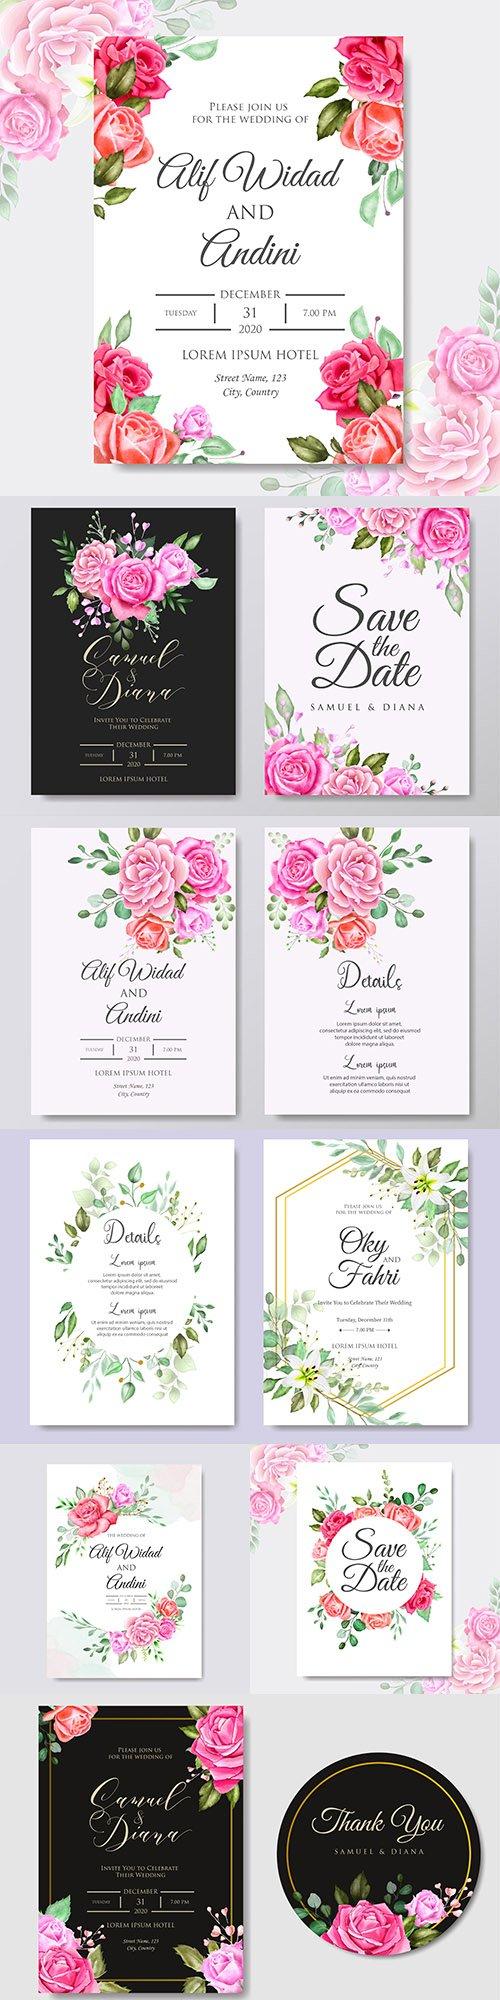 Wedding floral watercolor decorative invitations 15